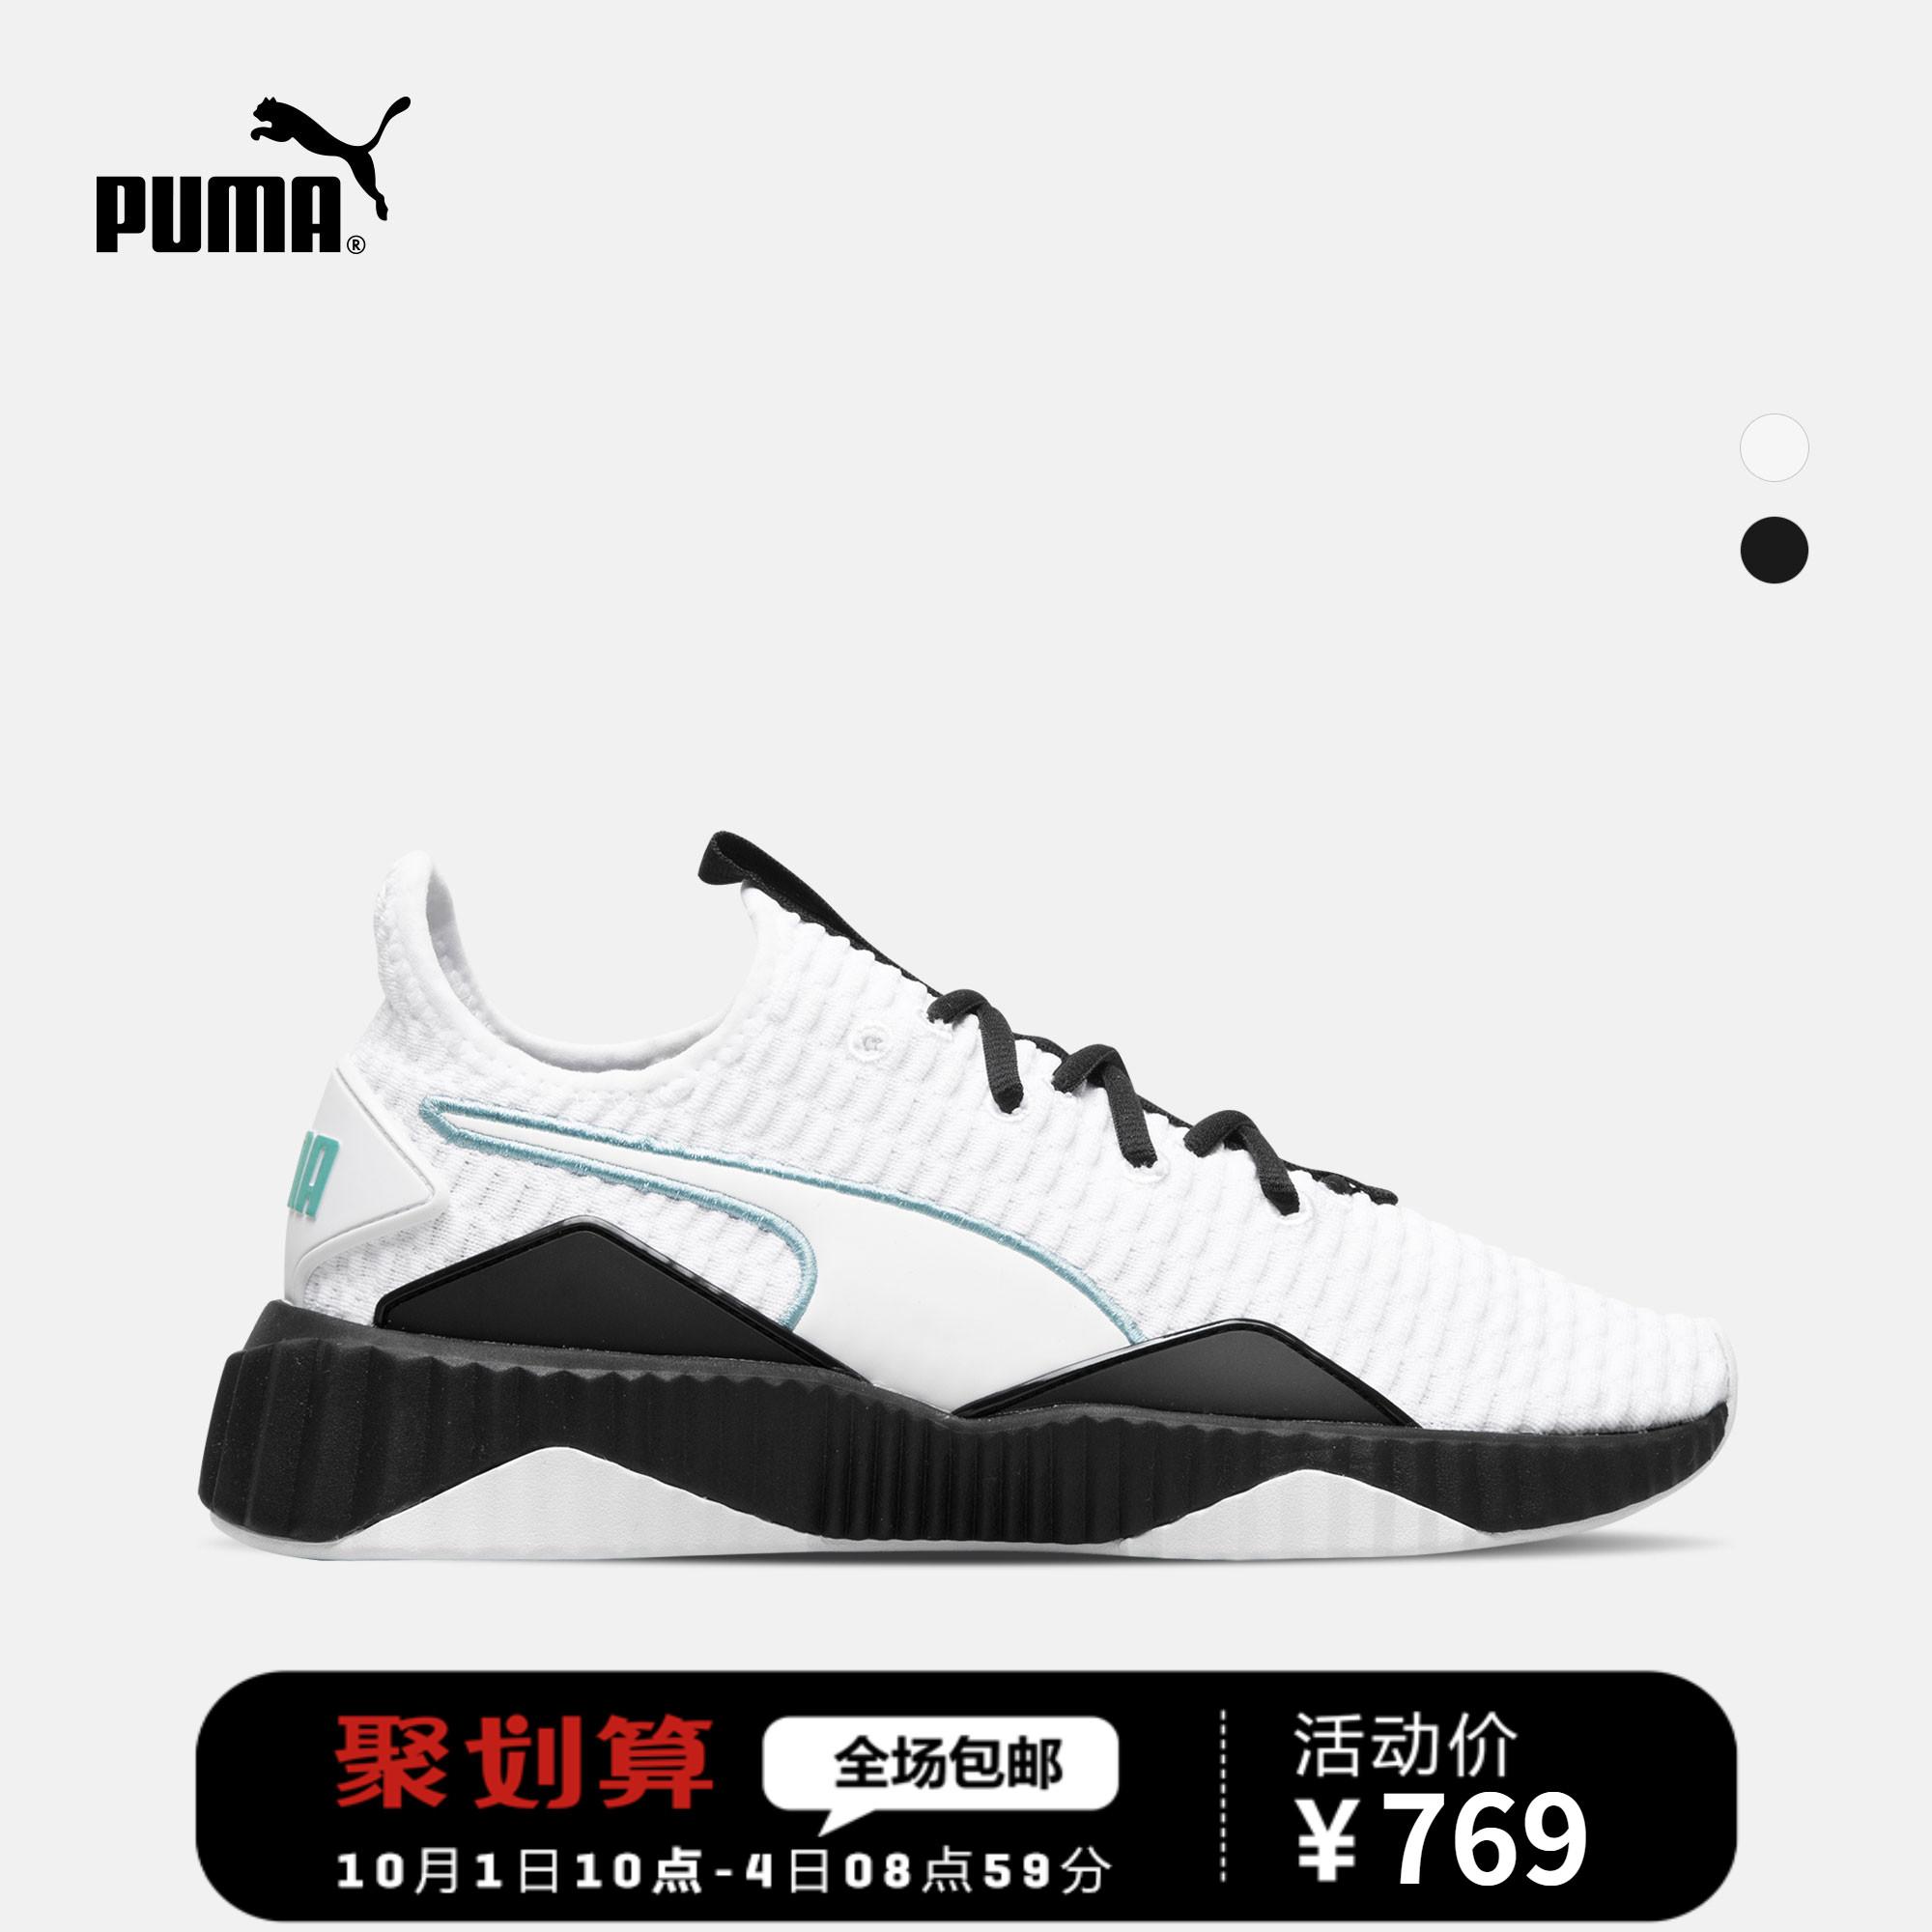 PUMA彪马官方 女子跑步鞋 Defy 190949